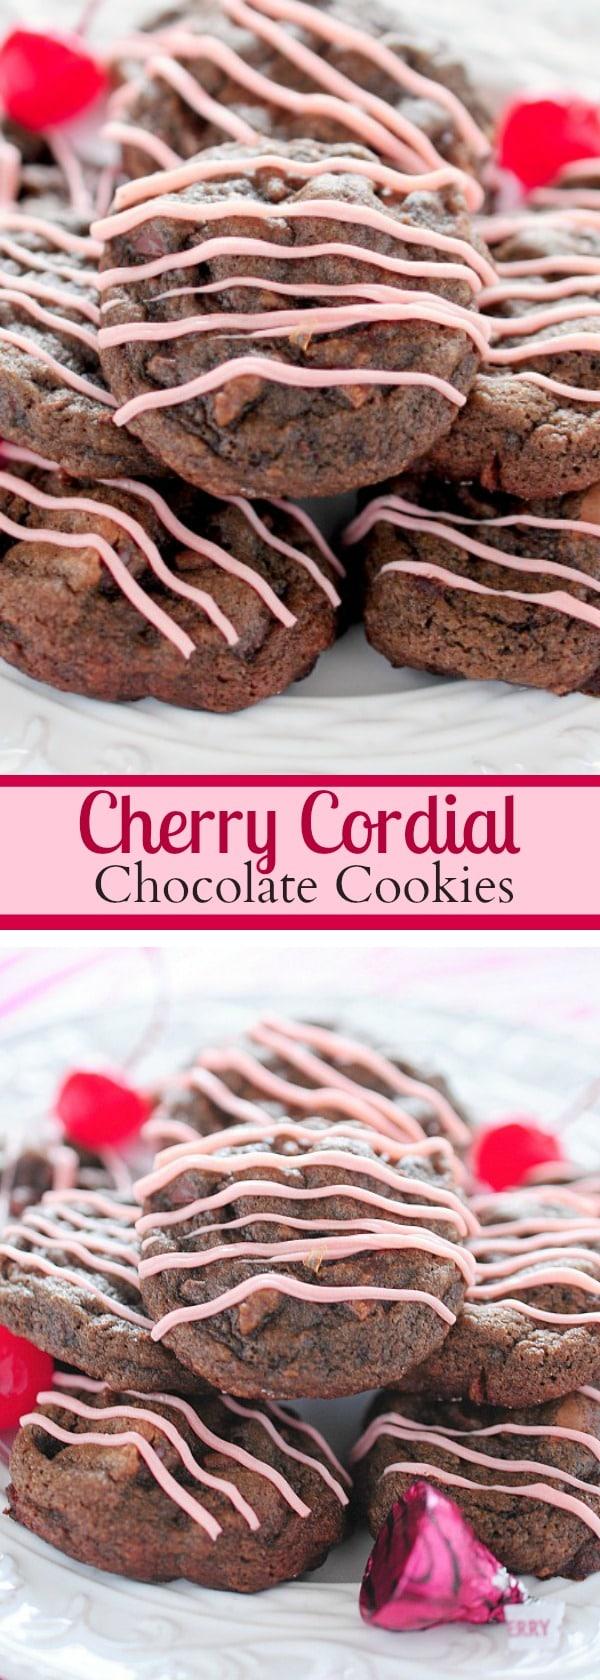 Cherry Cordial Chocolate Cookies